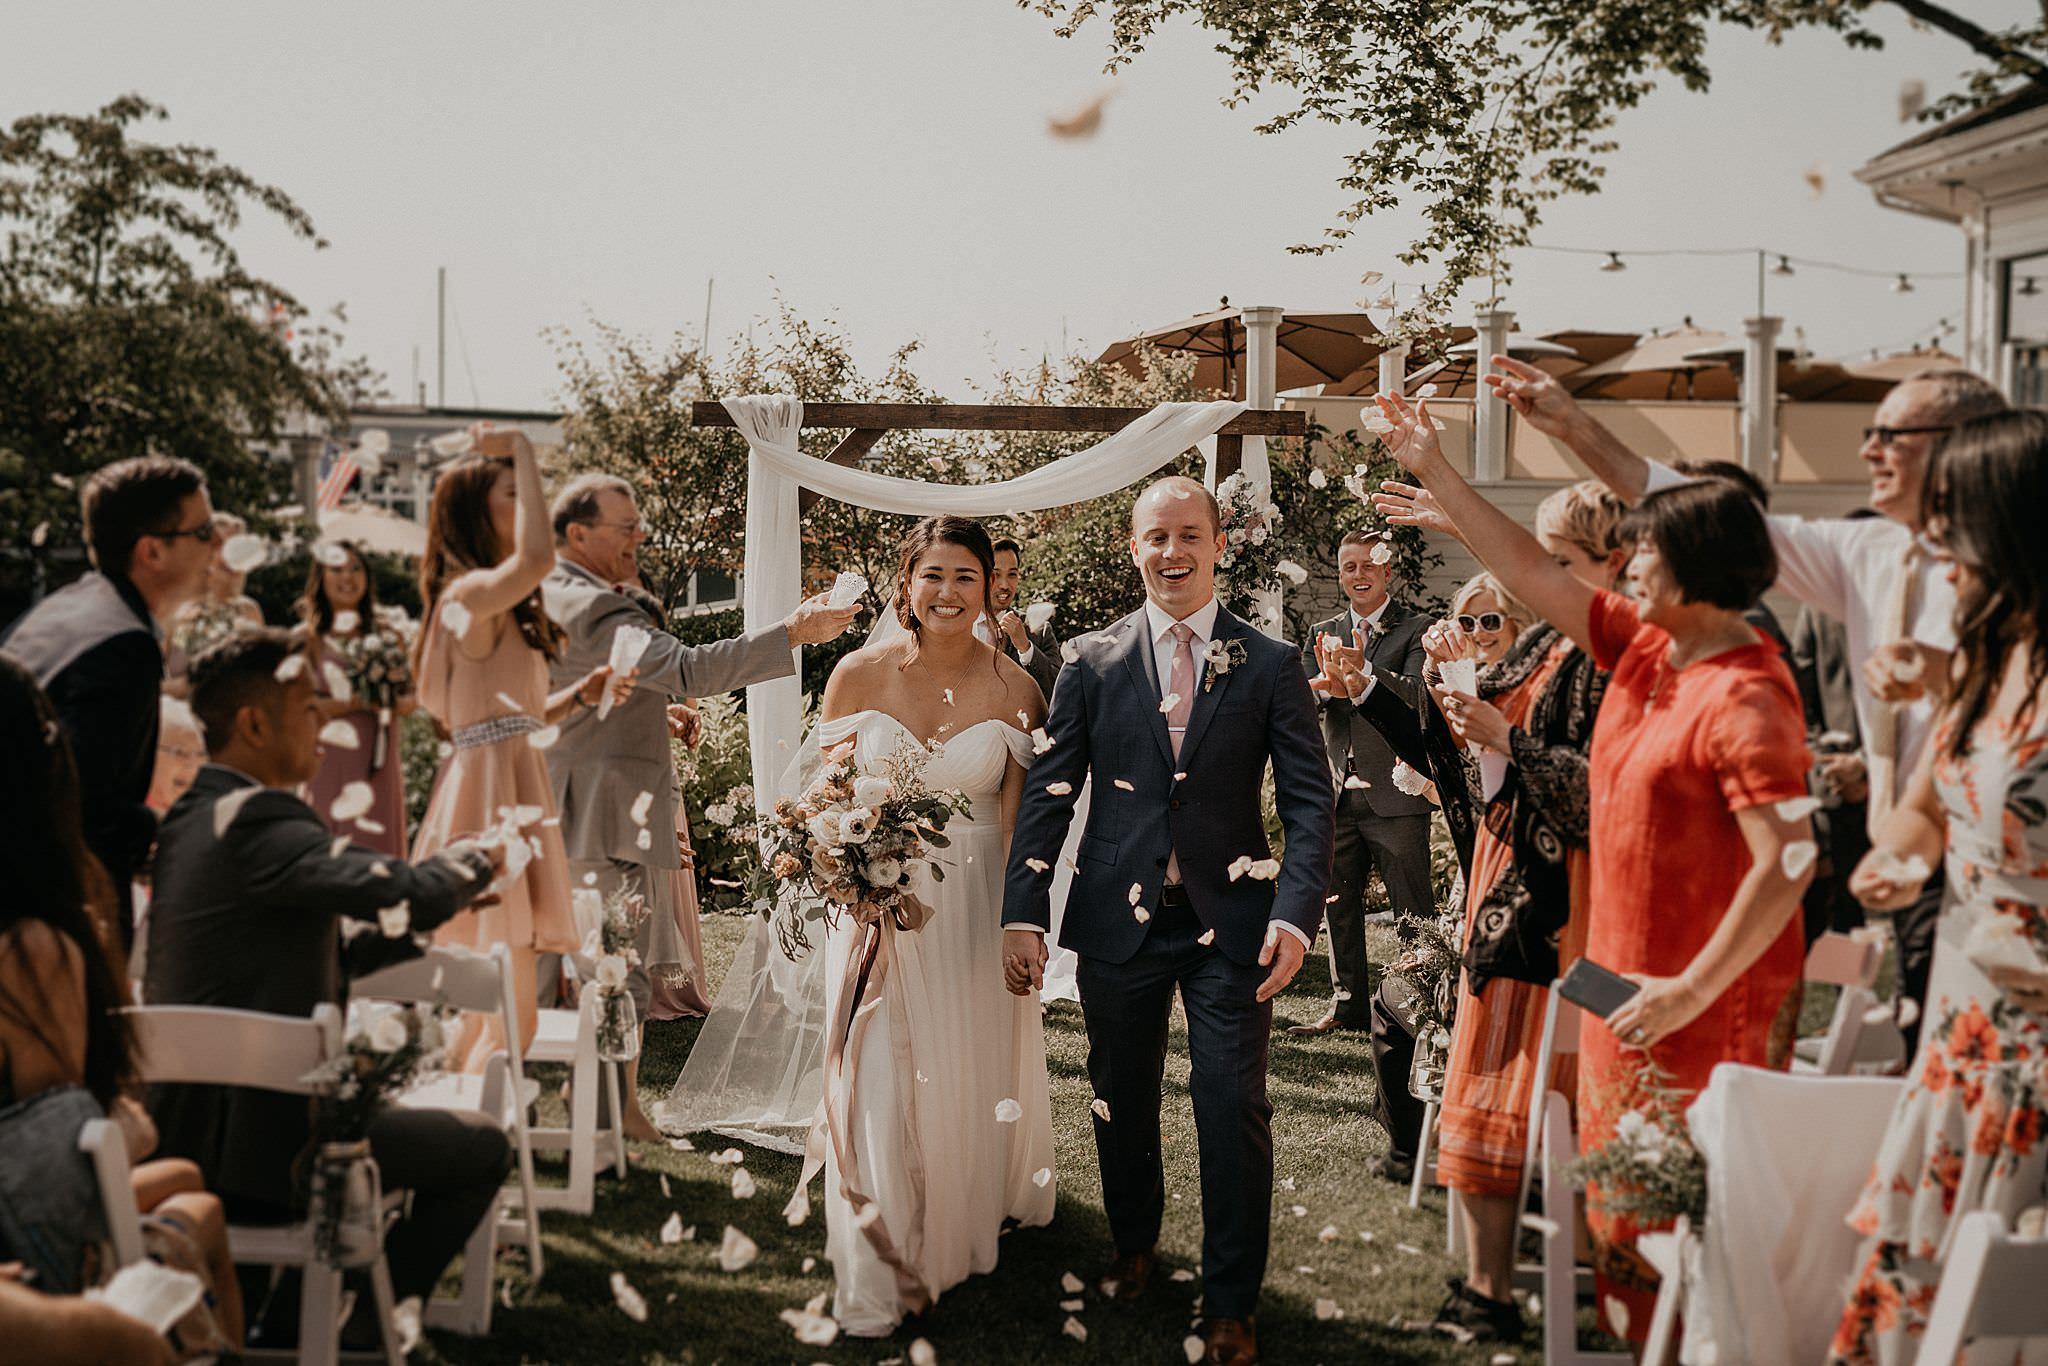 Roche Harbor resort wedding ceremony